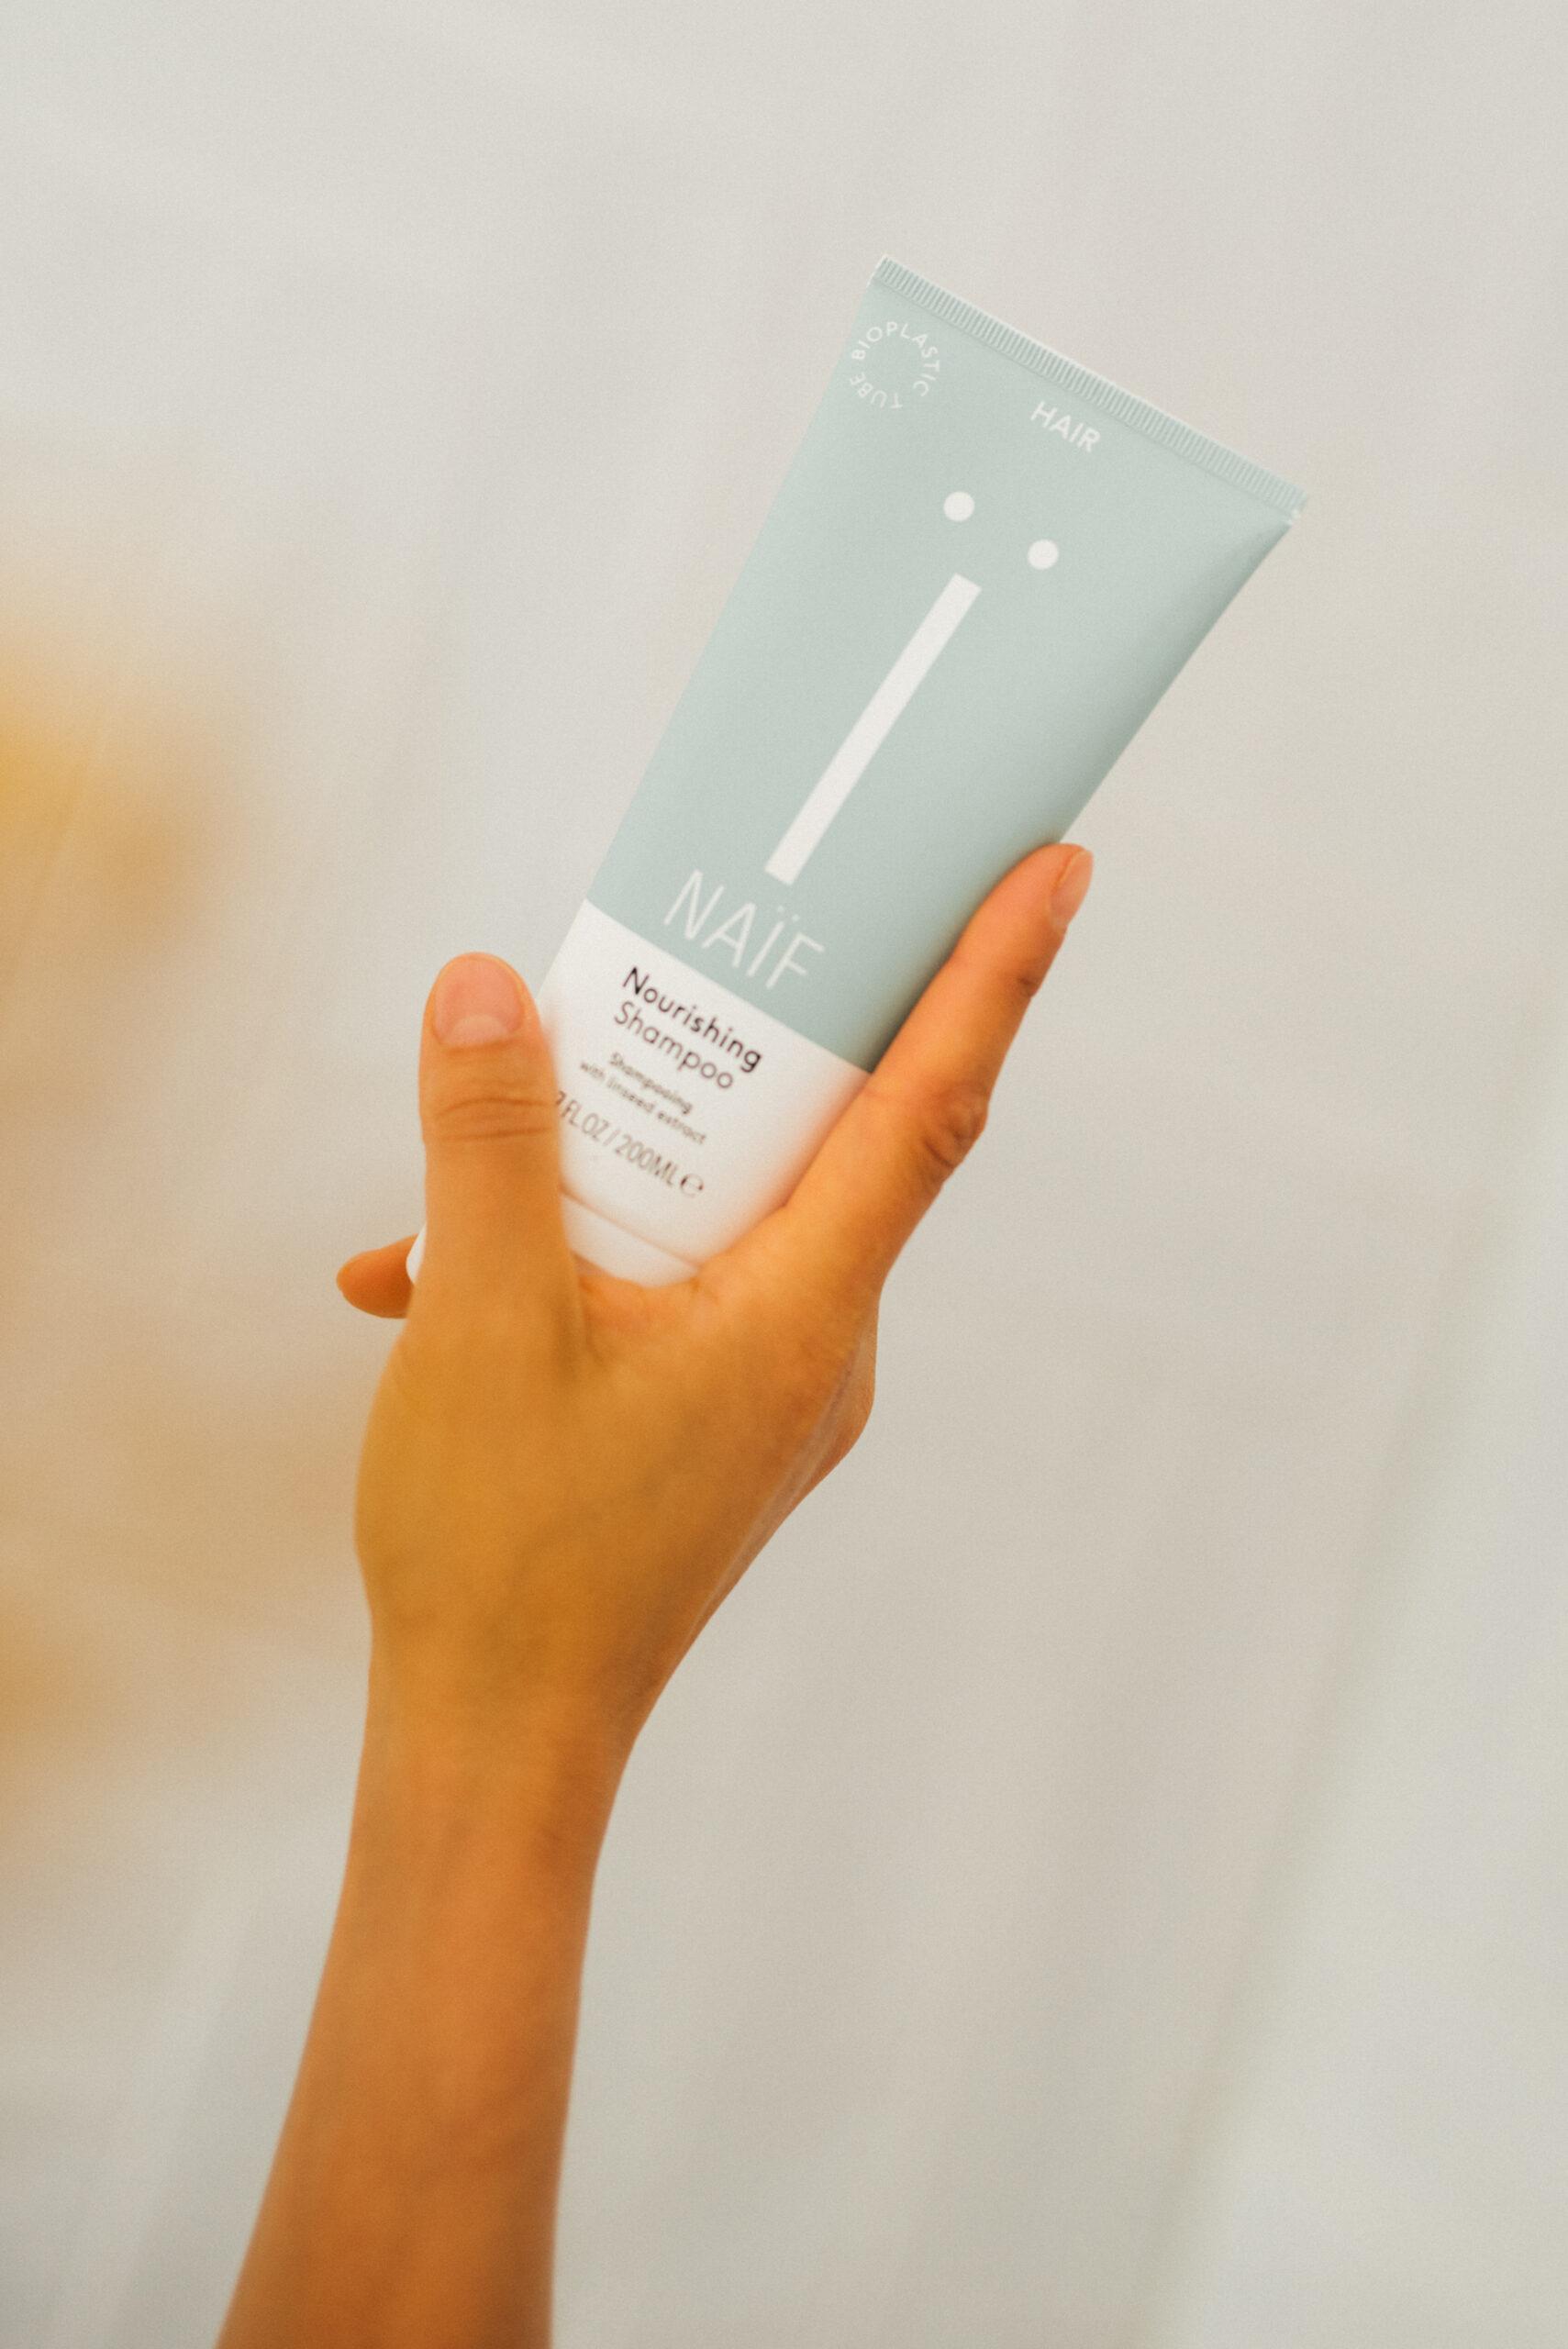 Klik om naar Naif Nourishing Shampoo Grownups te gaan